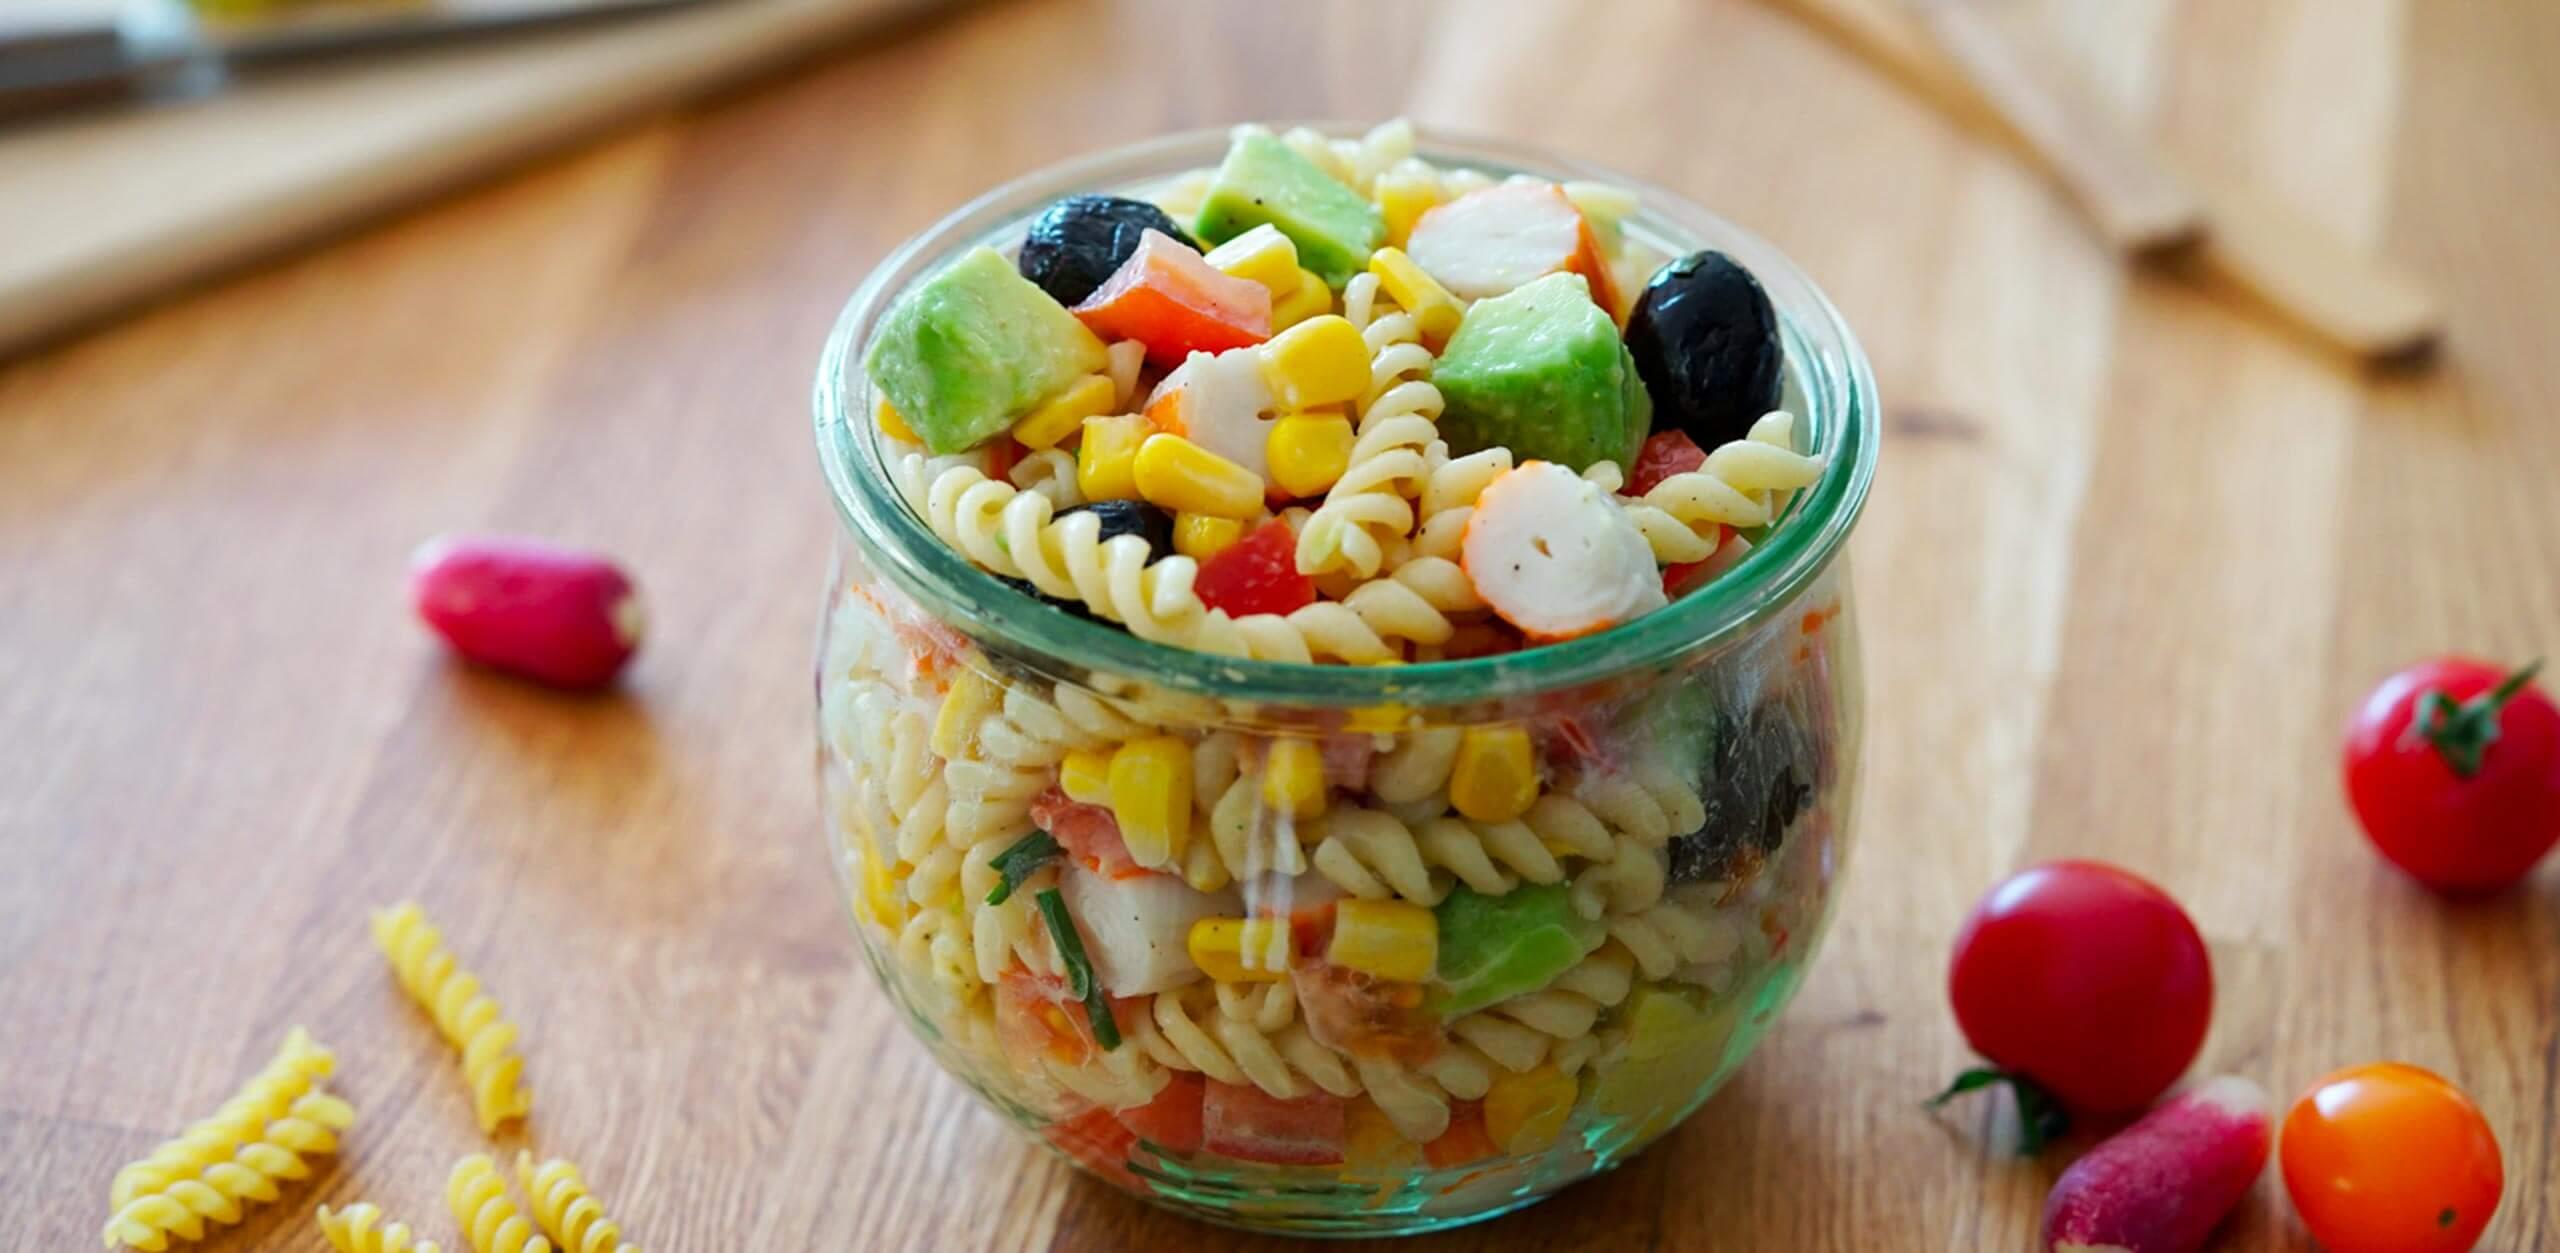 Salade d'été au surimi